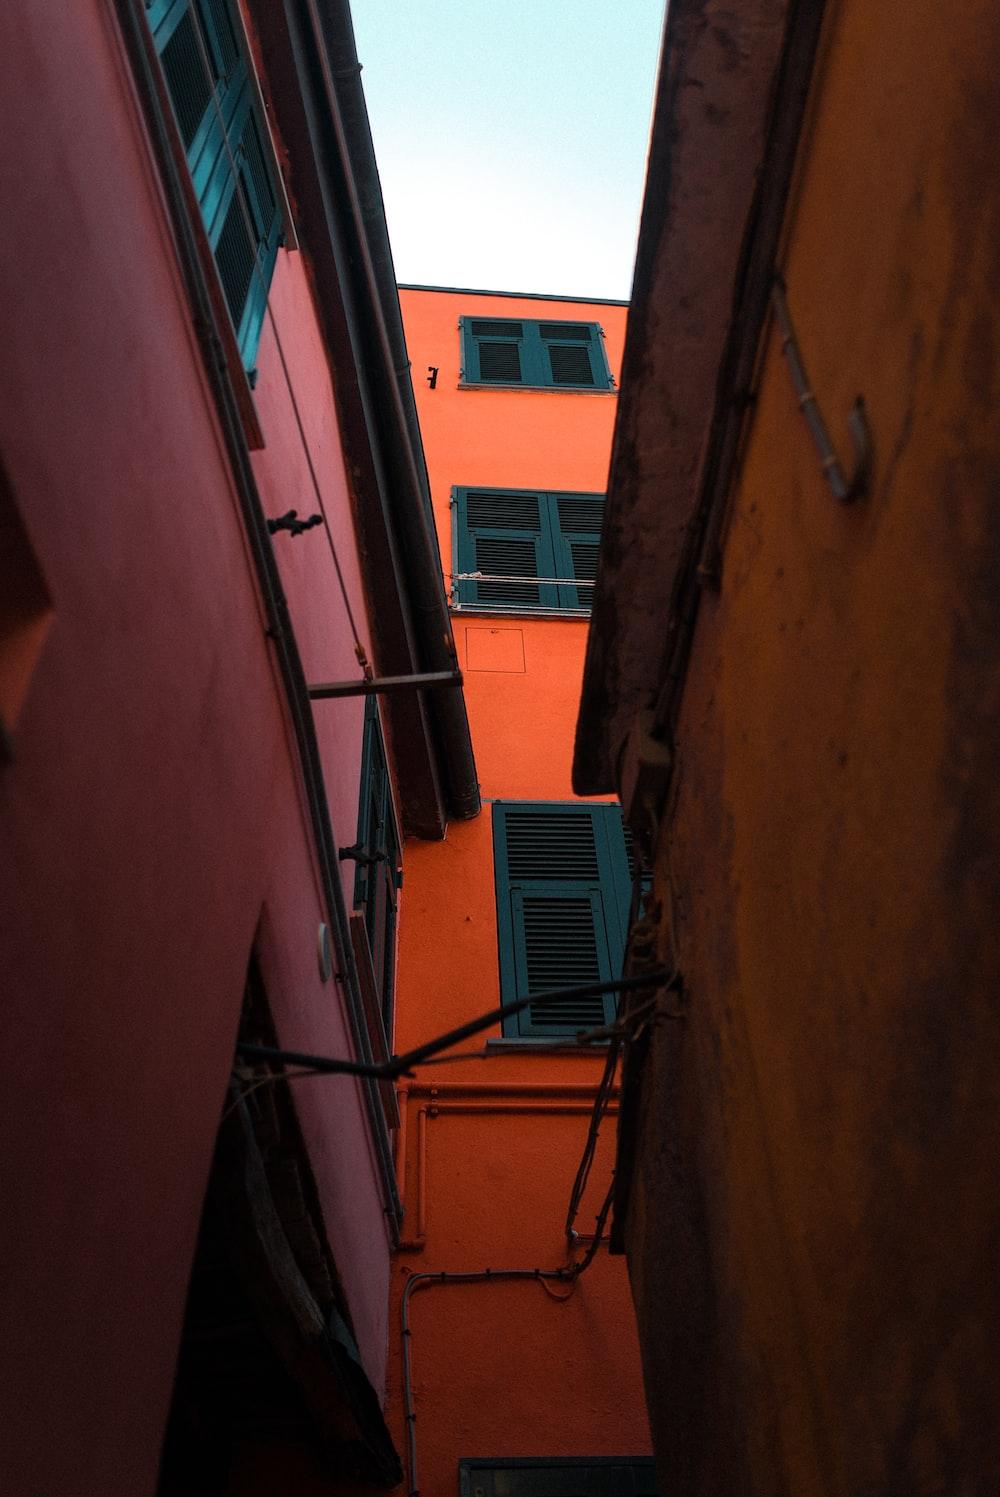 blue window type air conditioner on orange concrete building